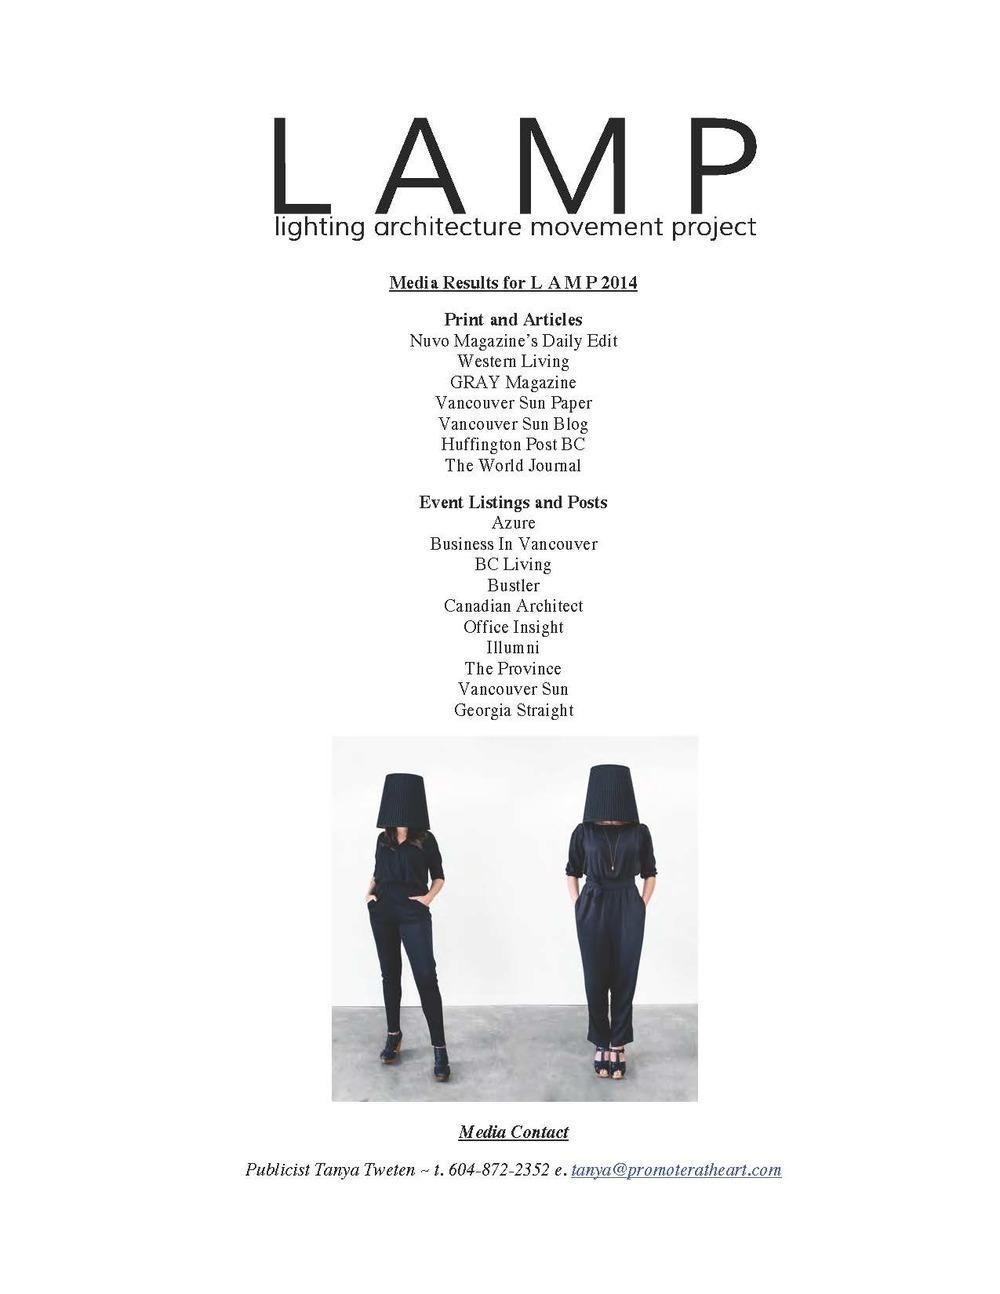 LAMP 2014 Press Kit_Page_01.jpg